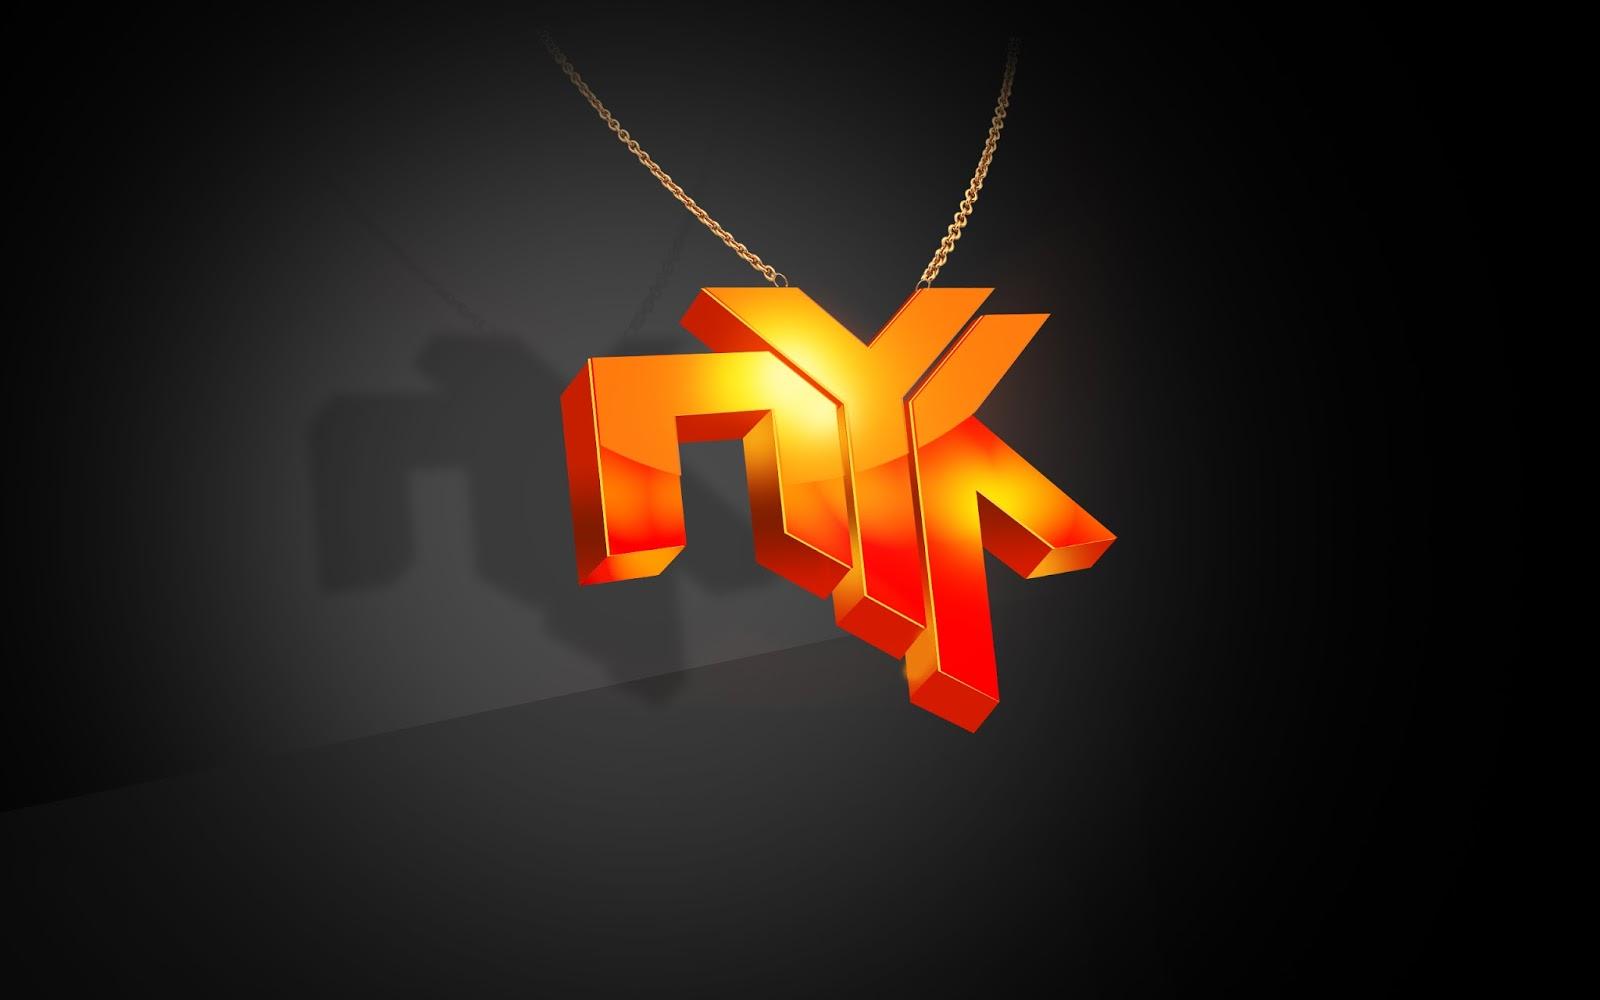 DJ NYK Desktop Wallpaper